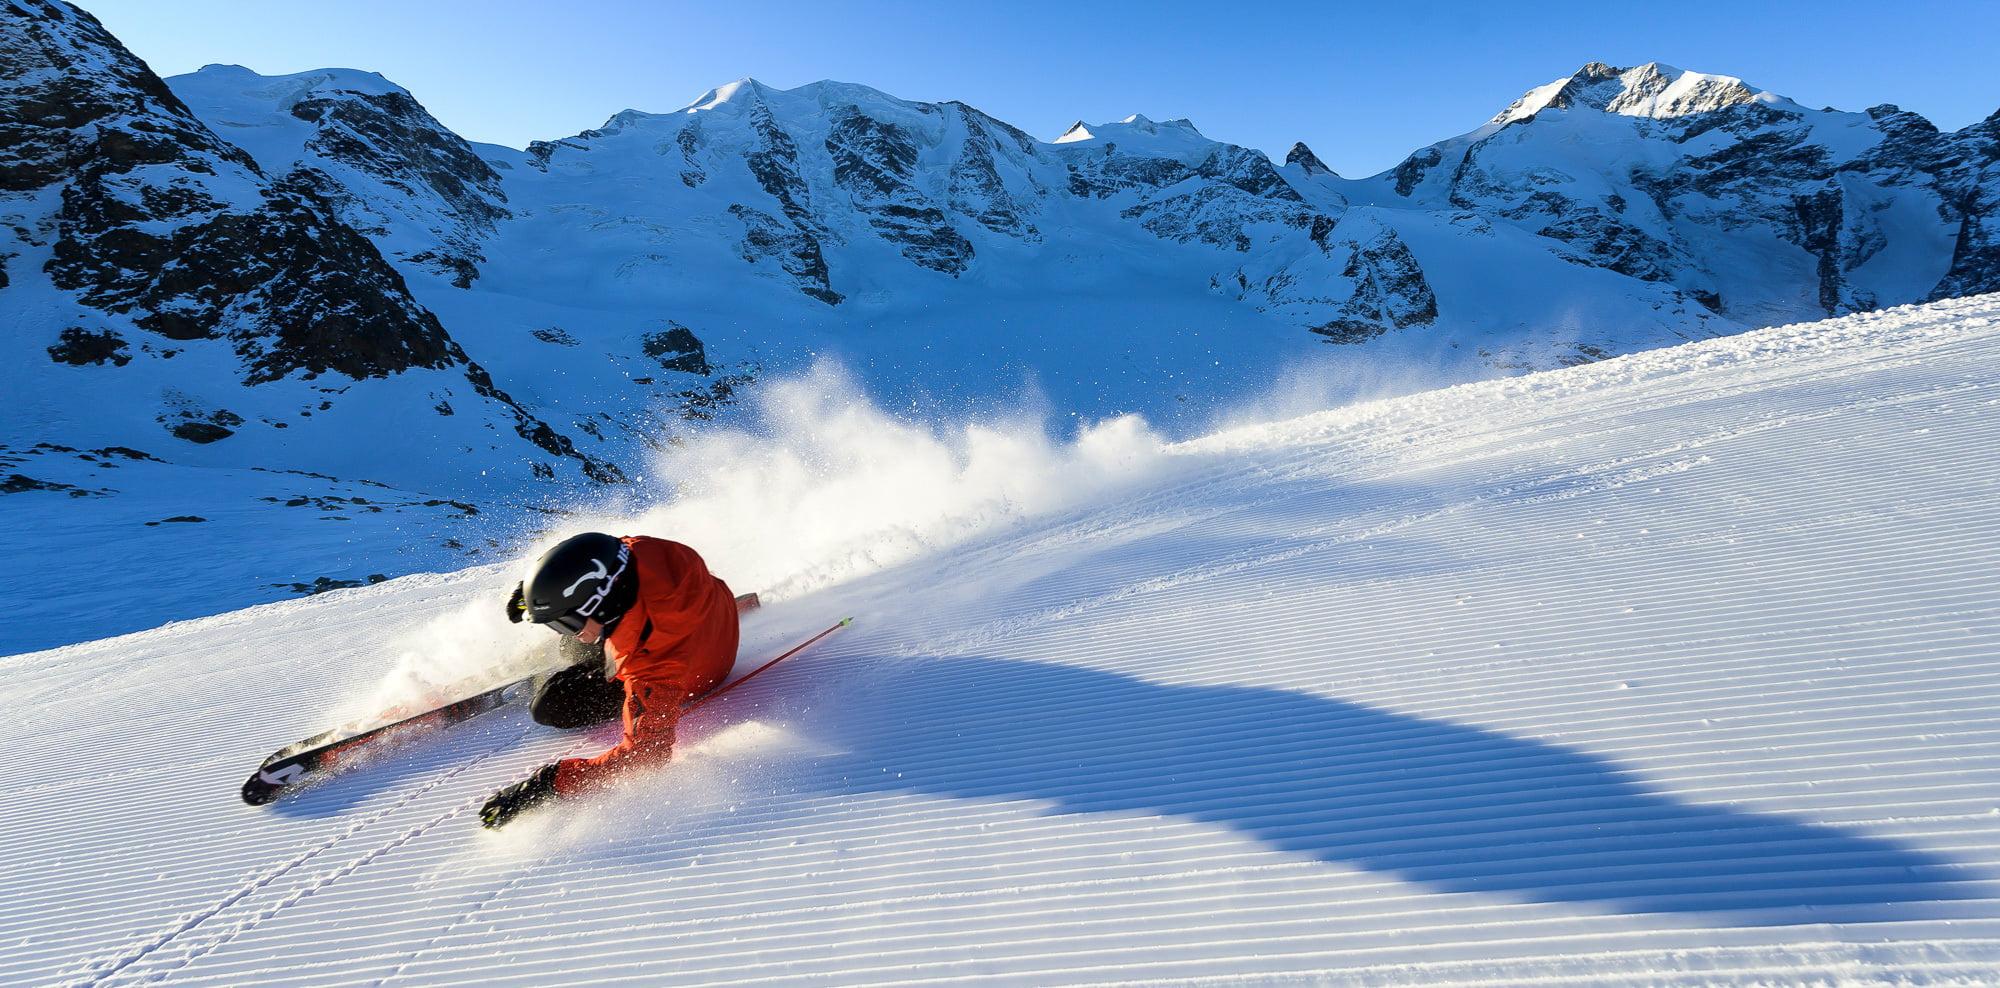 Diavolezza & Lagalb for winter sports enthusiasts